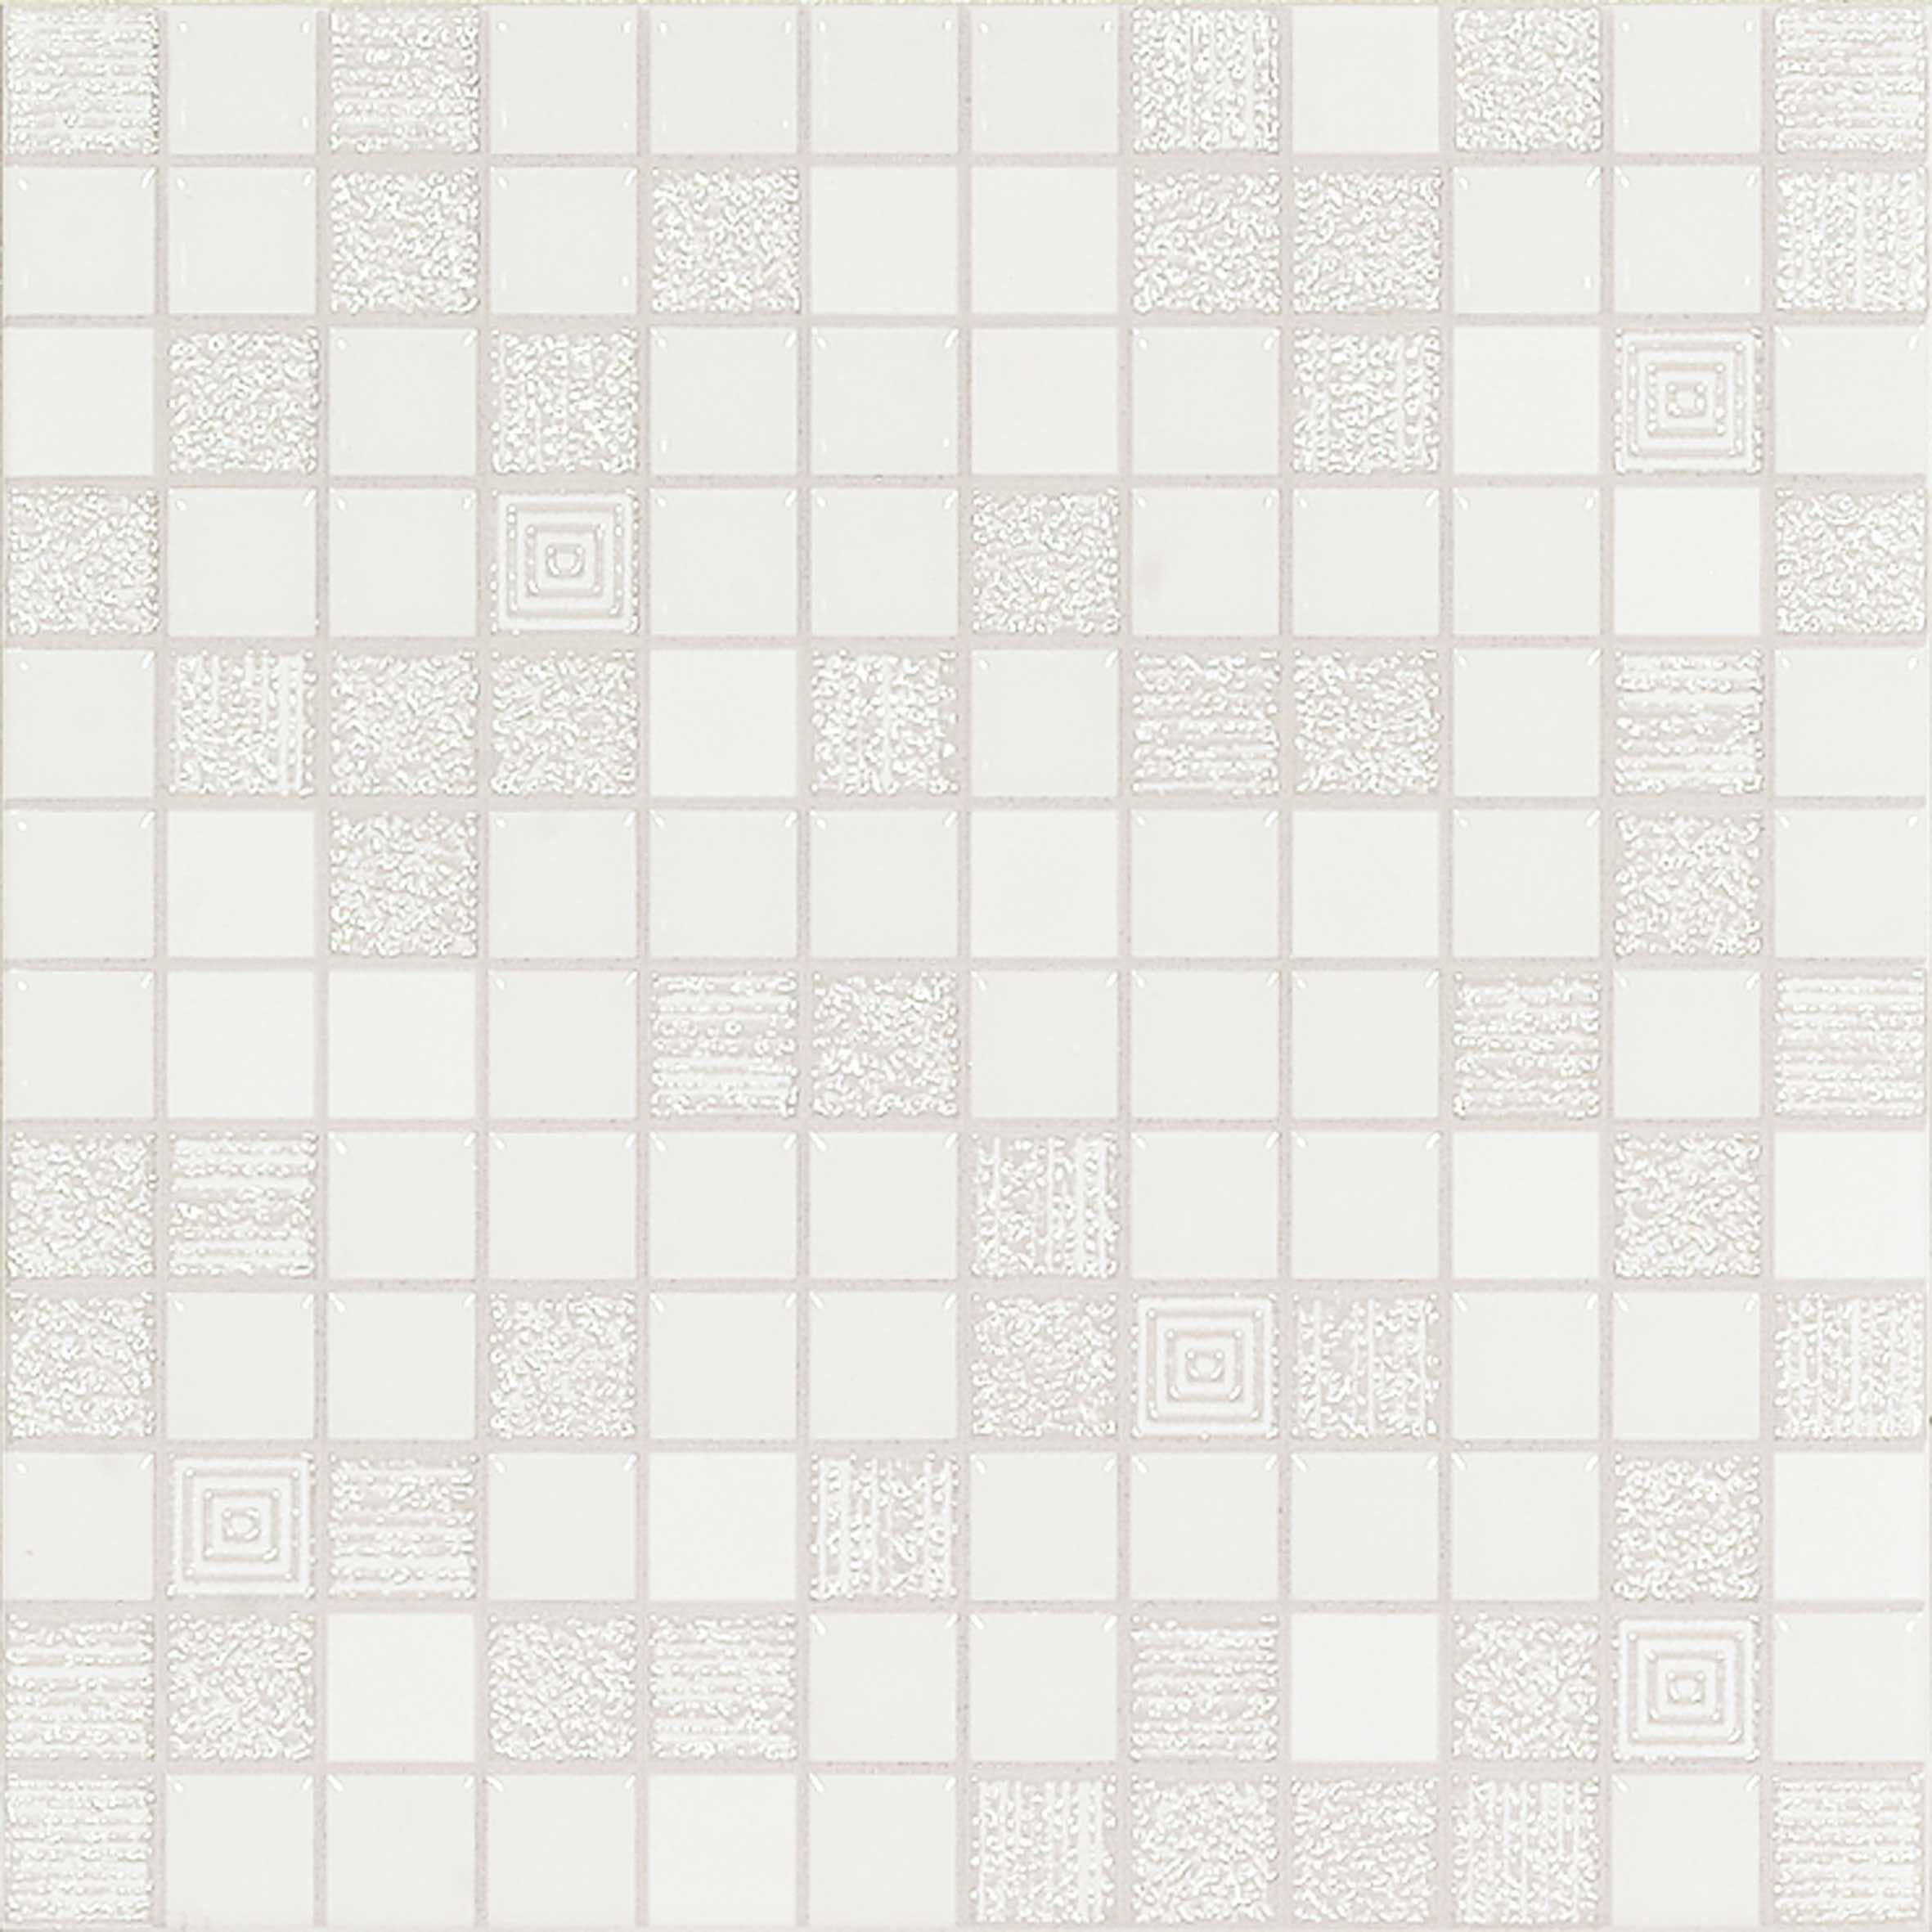 Azulejos ba o mosaico - Papel para azulejos de bano ...